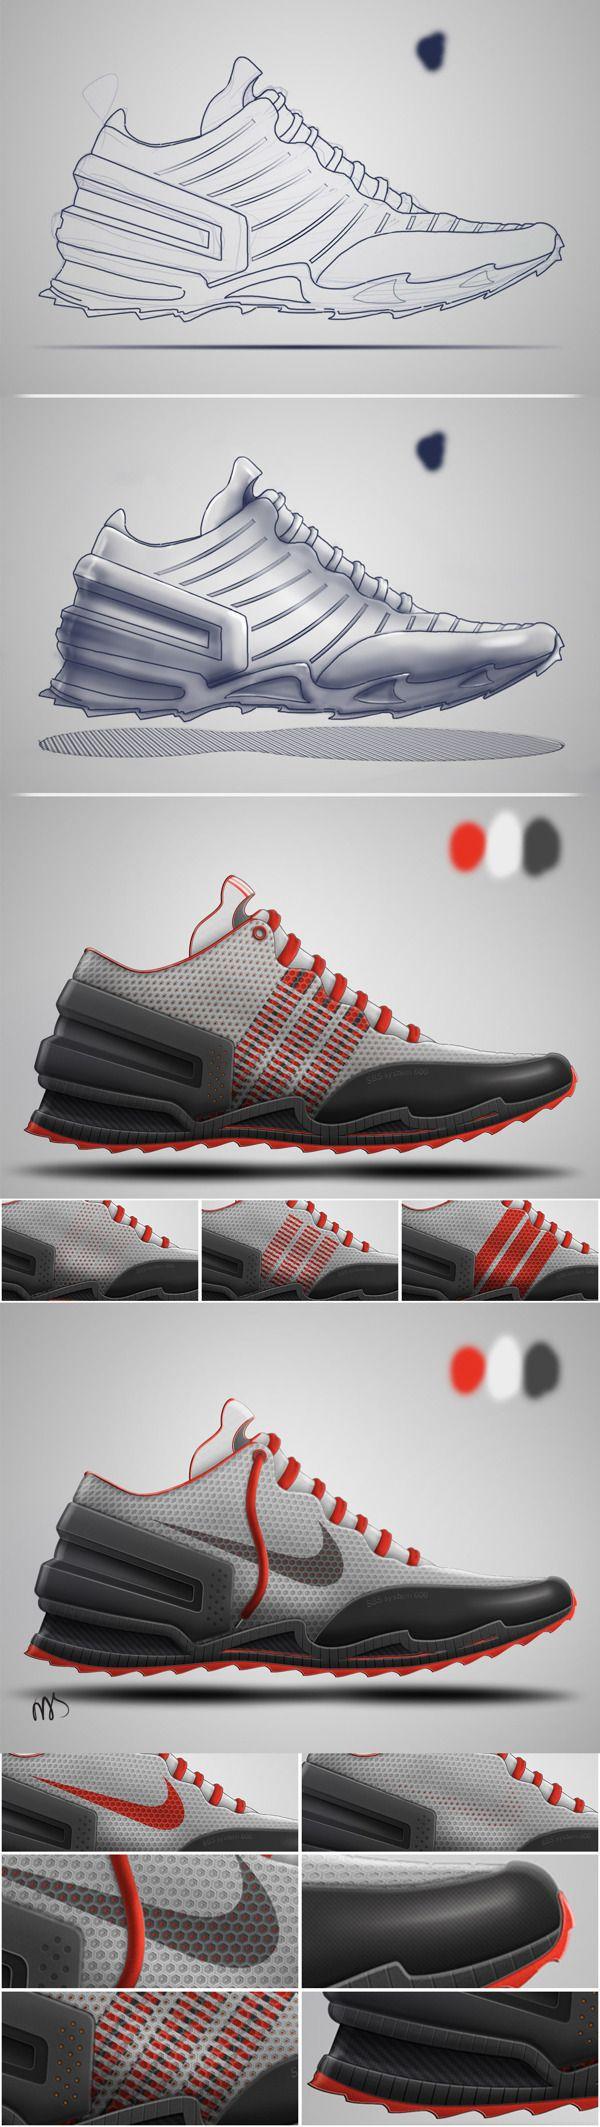 2014 Footwear Sketches by Nassir Khamin, via Behance